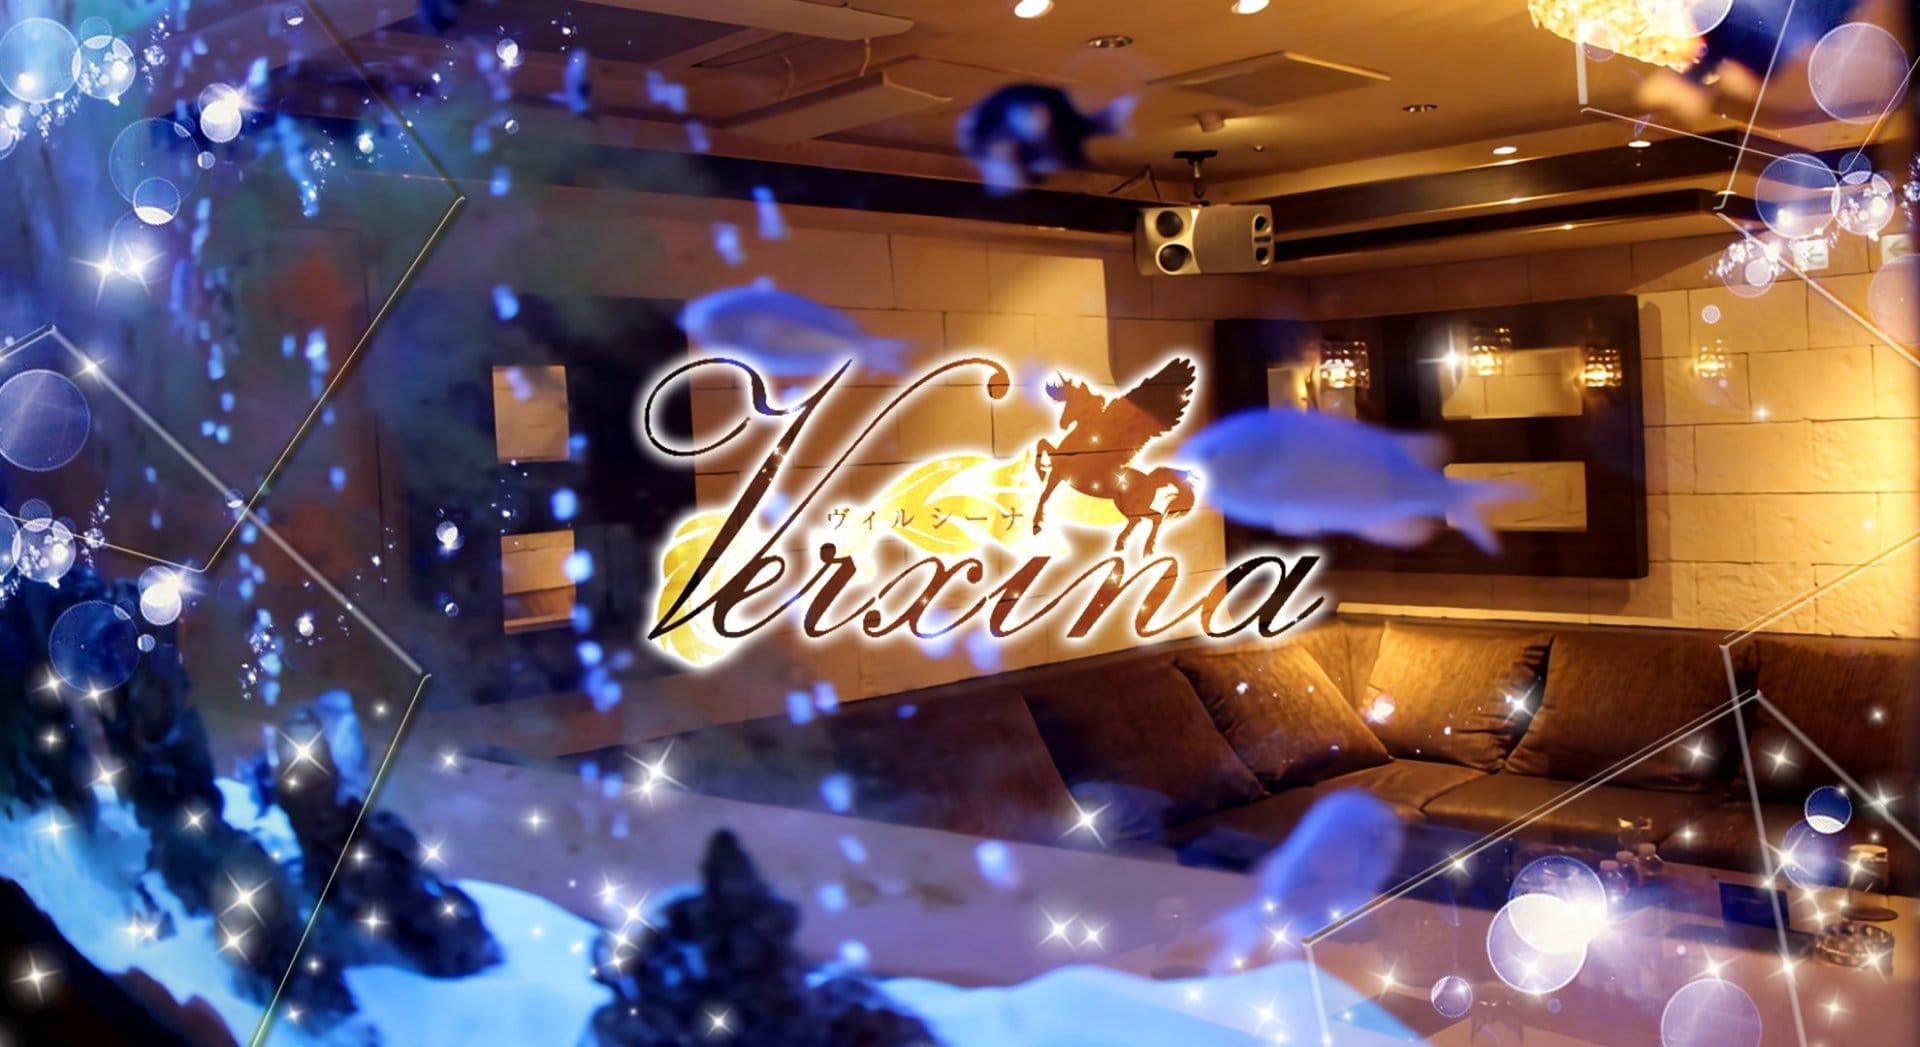 VERXINA(ヴィルシーナ) 栄キャバクラ TOP画像